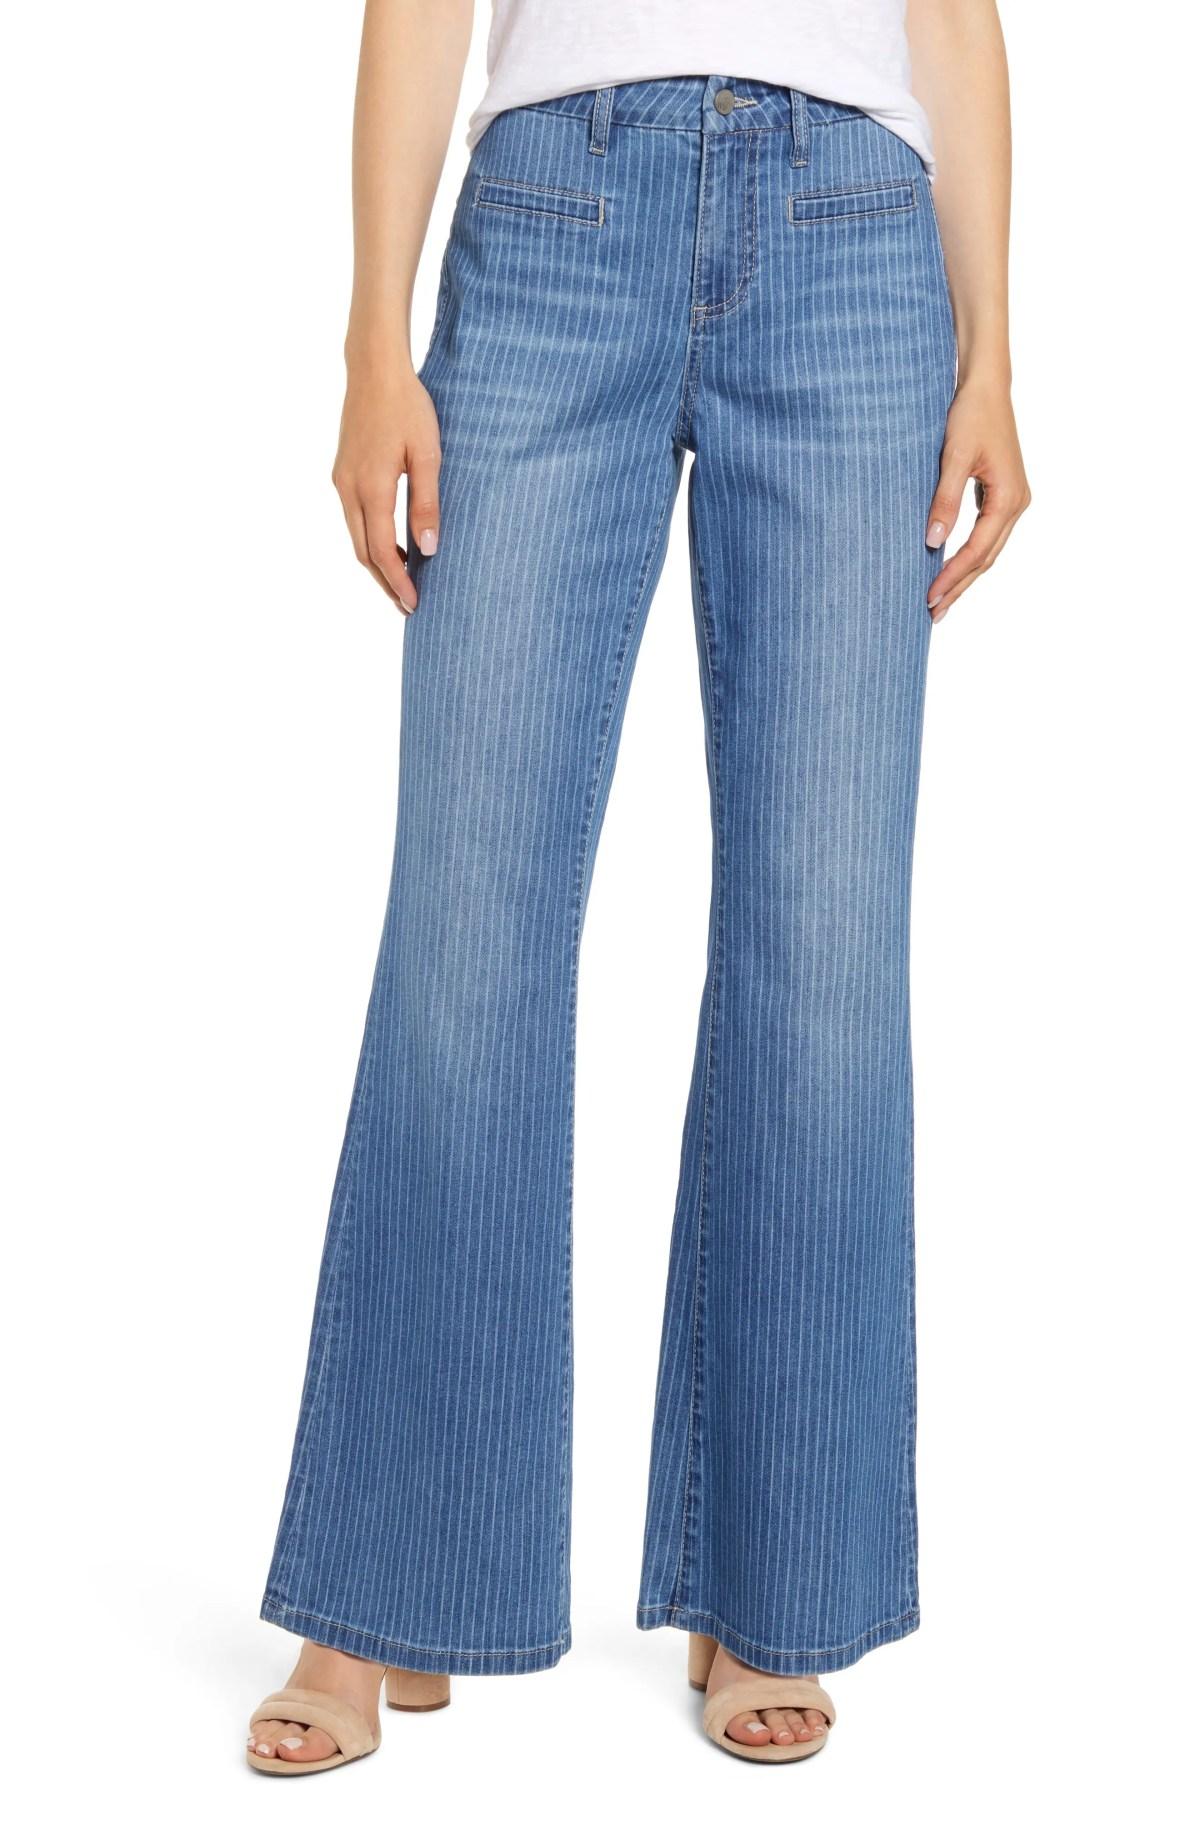 WASH LAB Pinstripe Flare Leg Jeans, Main, color, BLUE SKY STRIPE